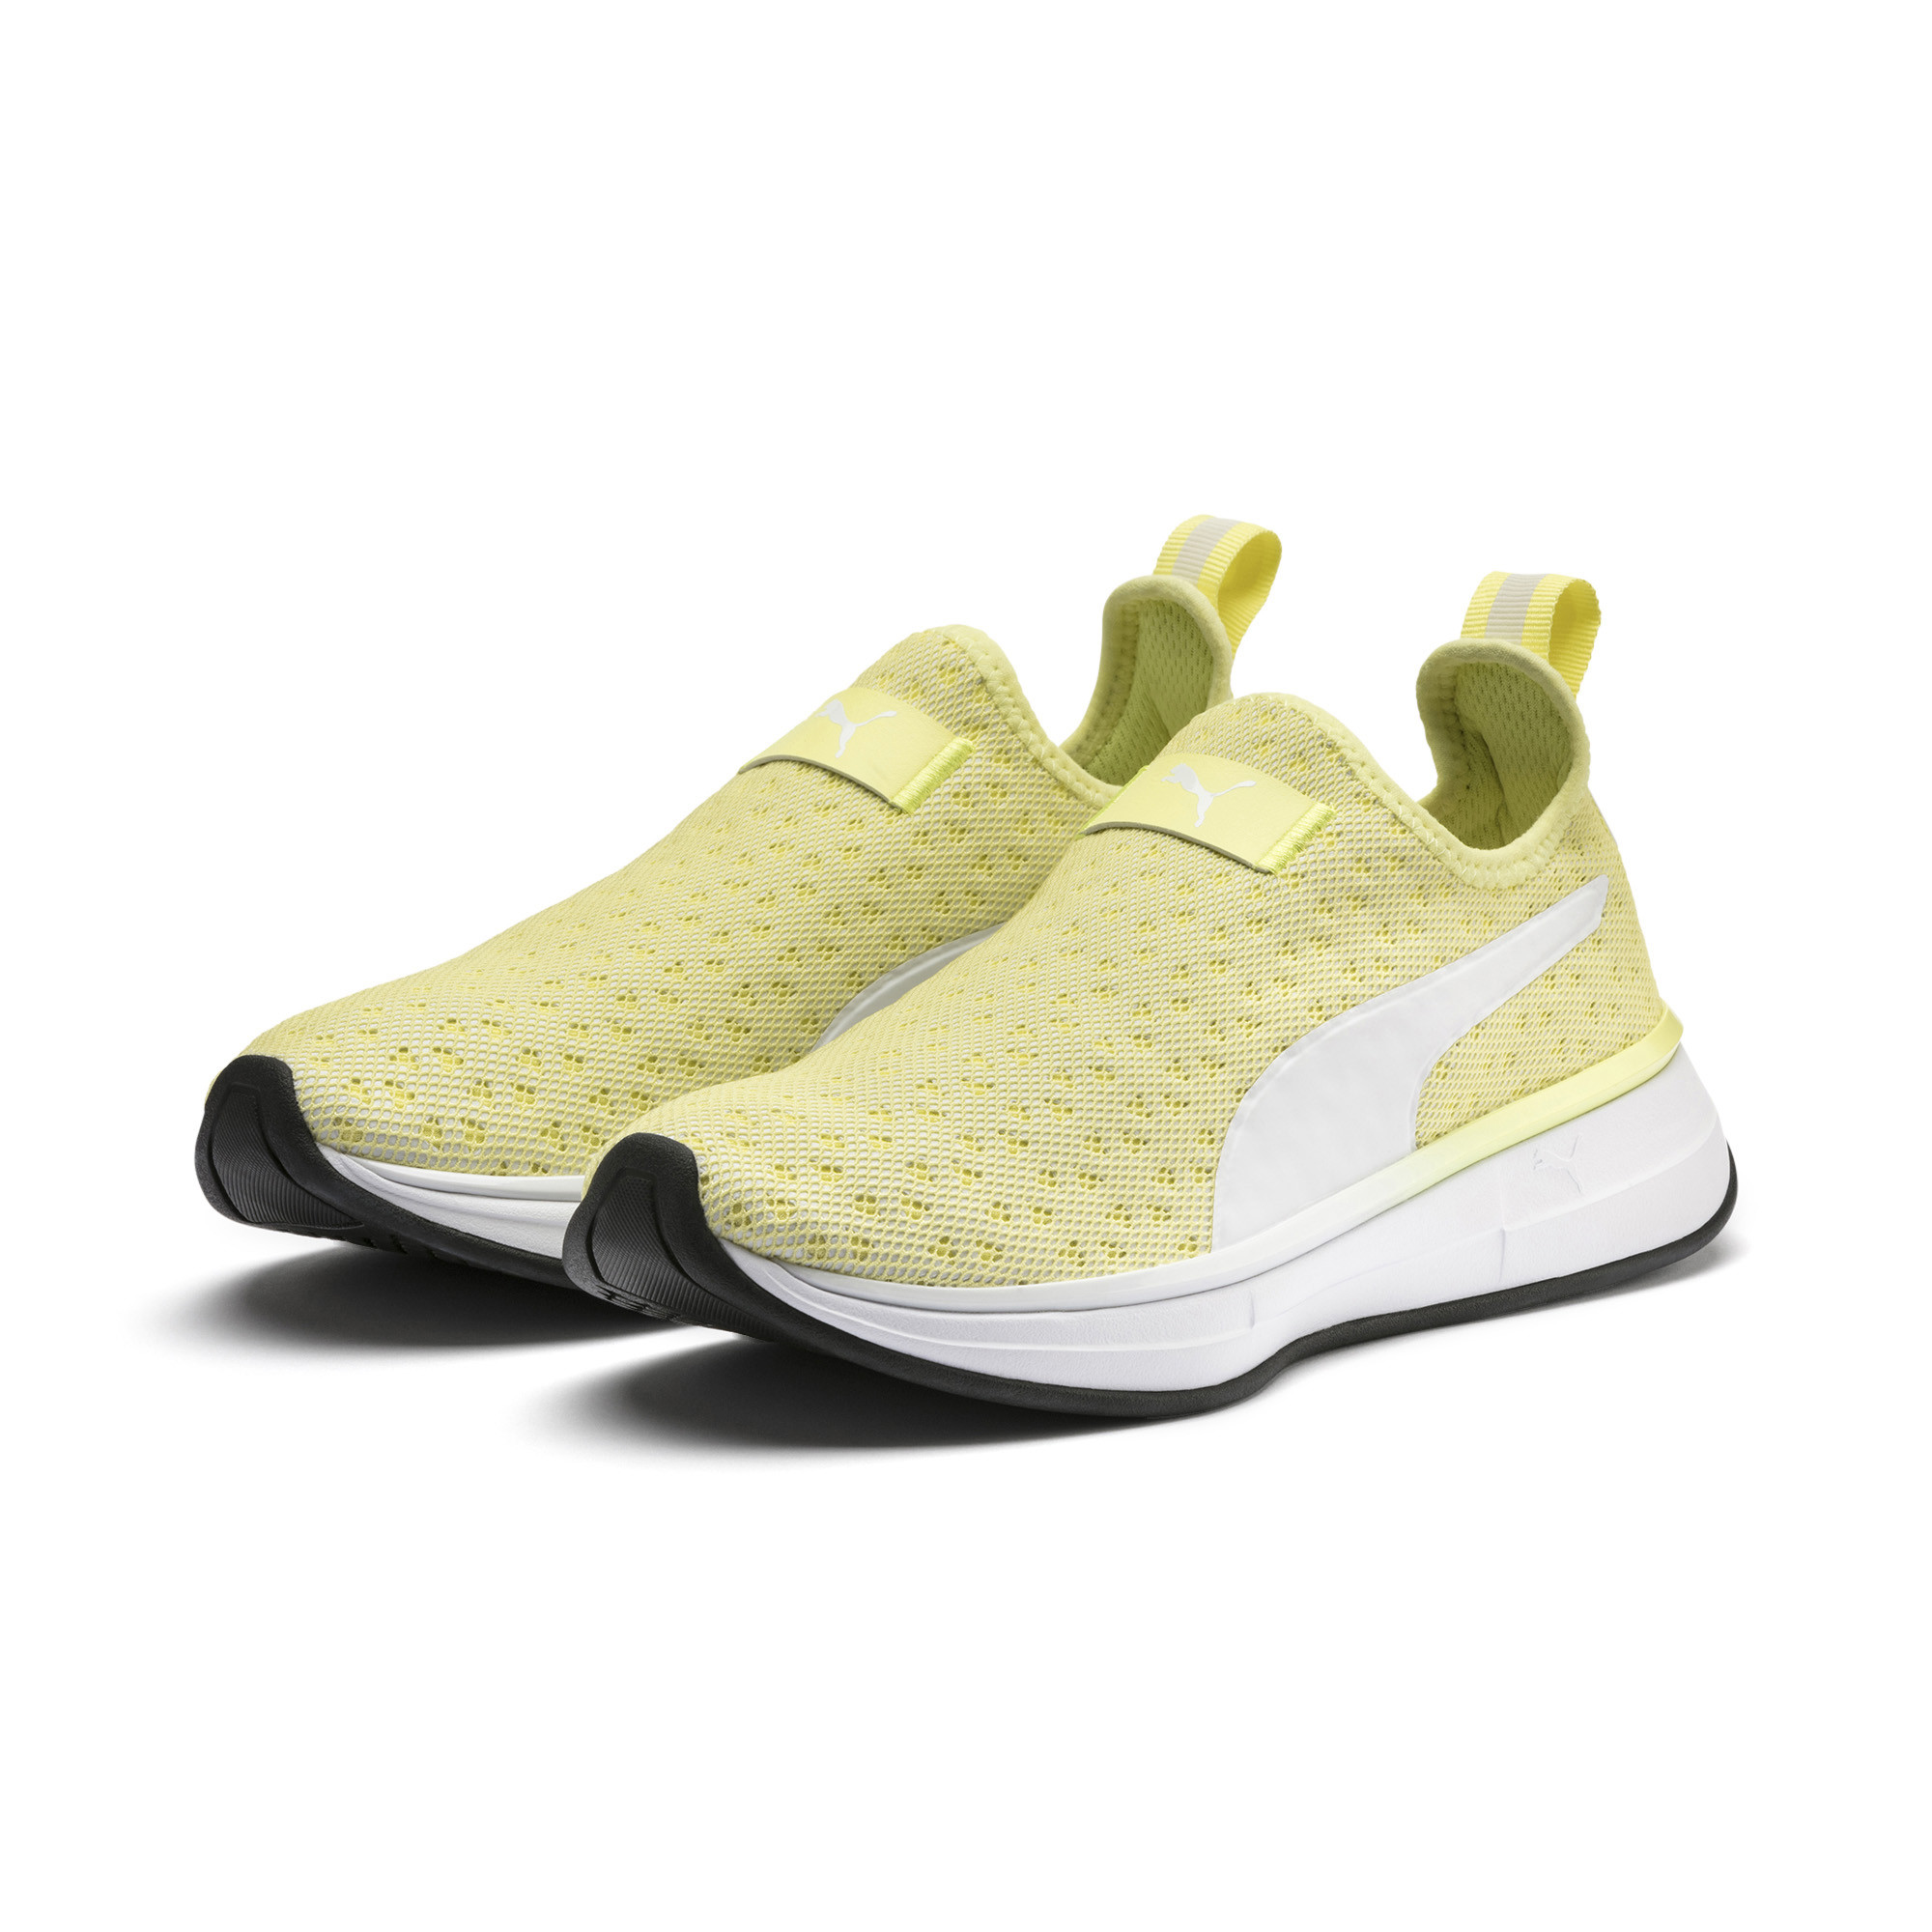 Image Puma PUMA x SELENA GOMEZ Slip-On Women's Training Shoes #3